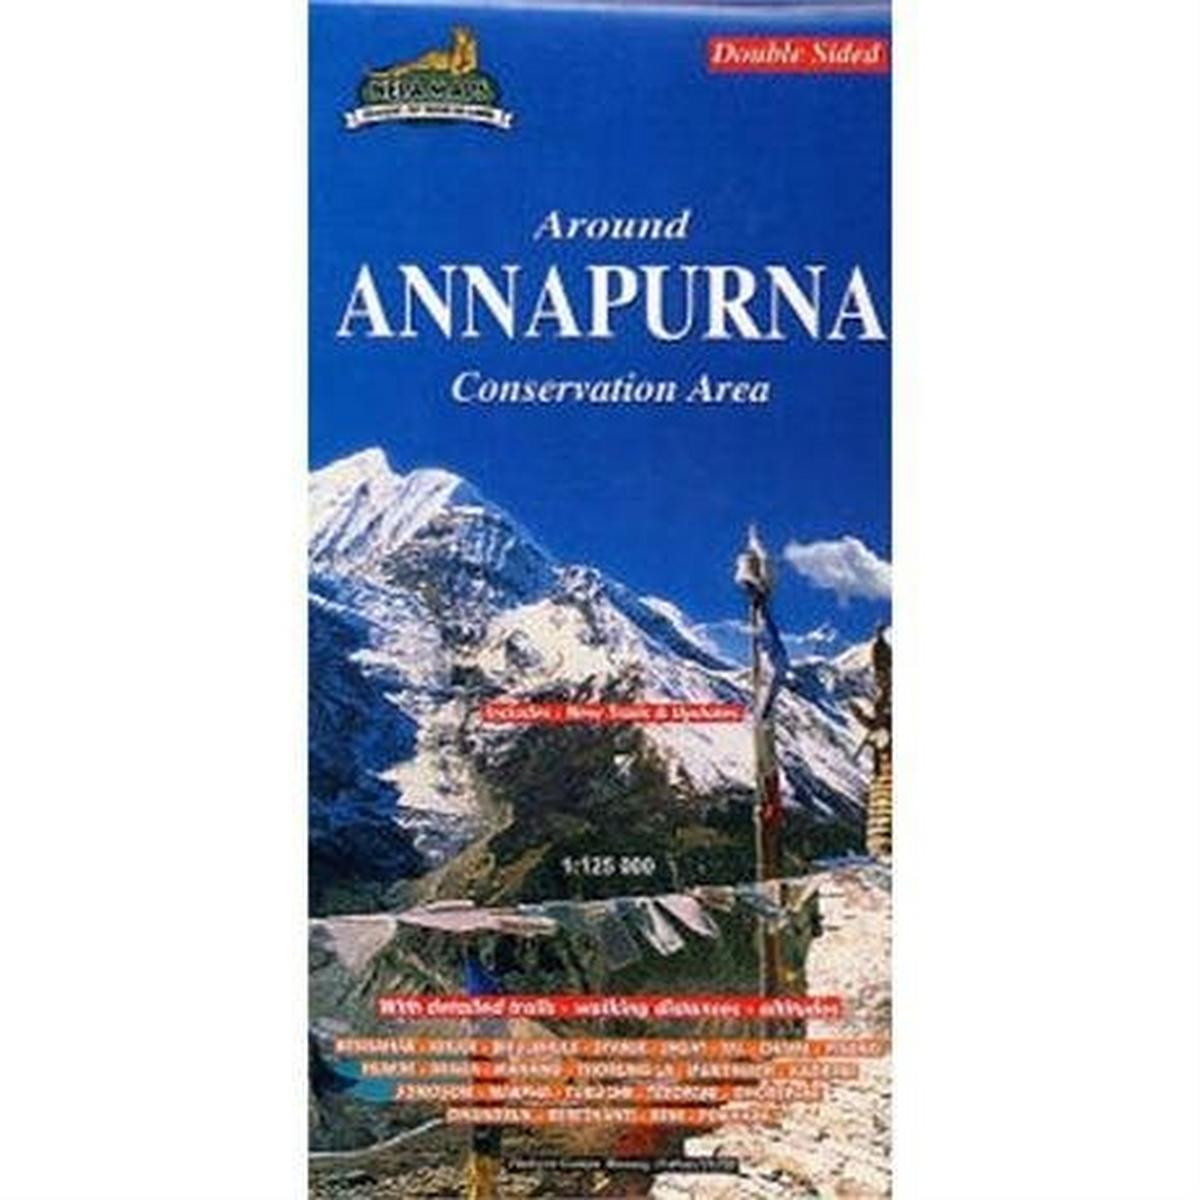 Miscellaneous Nepal Map: Around Pokhara Valley 1:50,000 / Around Annapurna 1:125,000